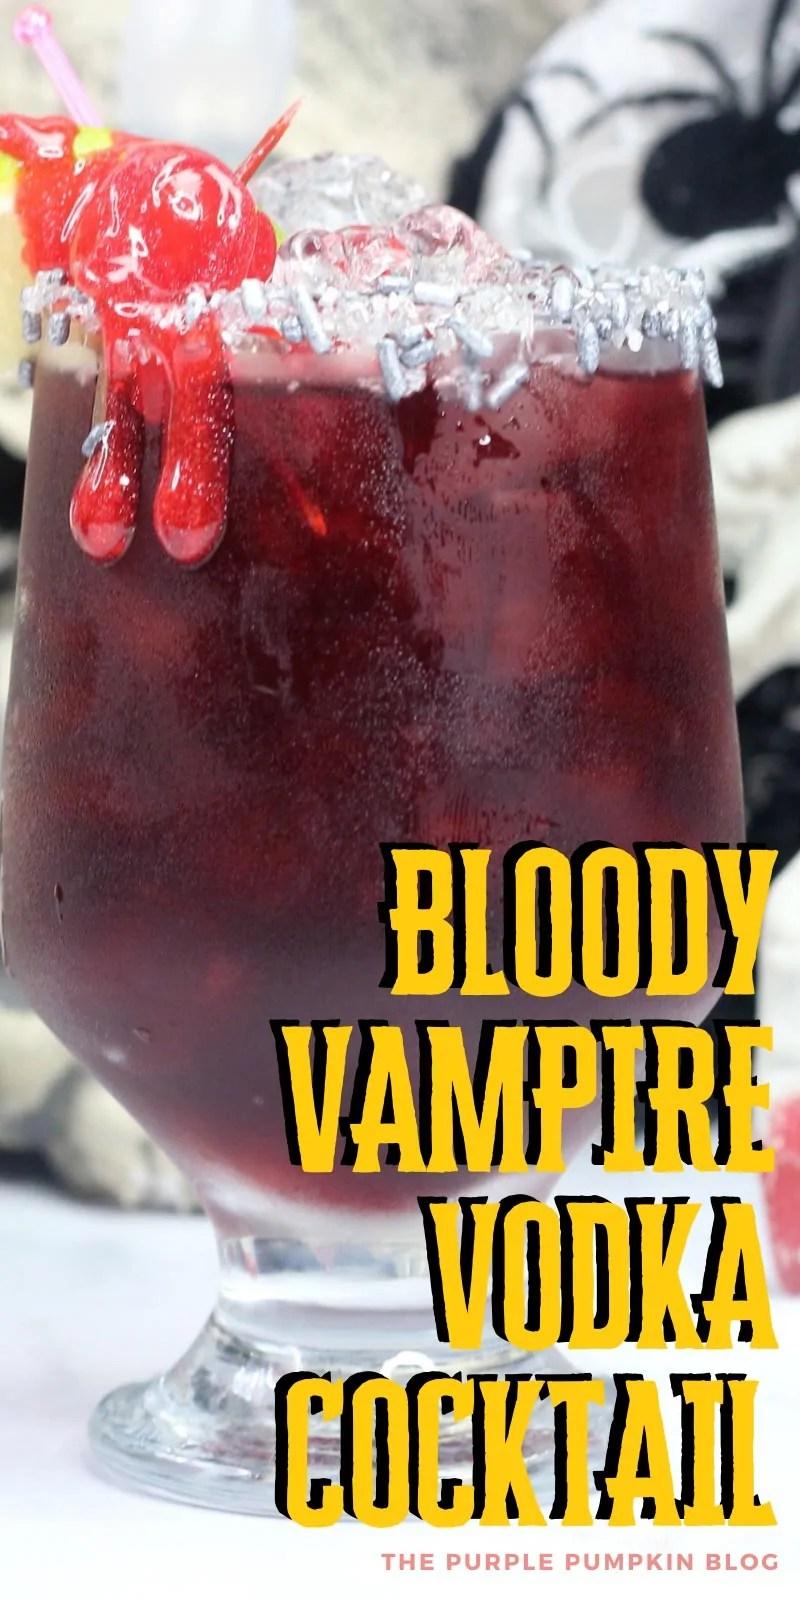 Bloody Vampire Vodka Cocktail